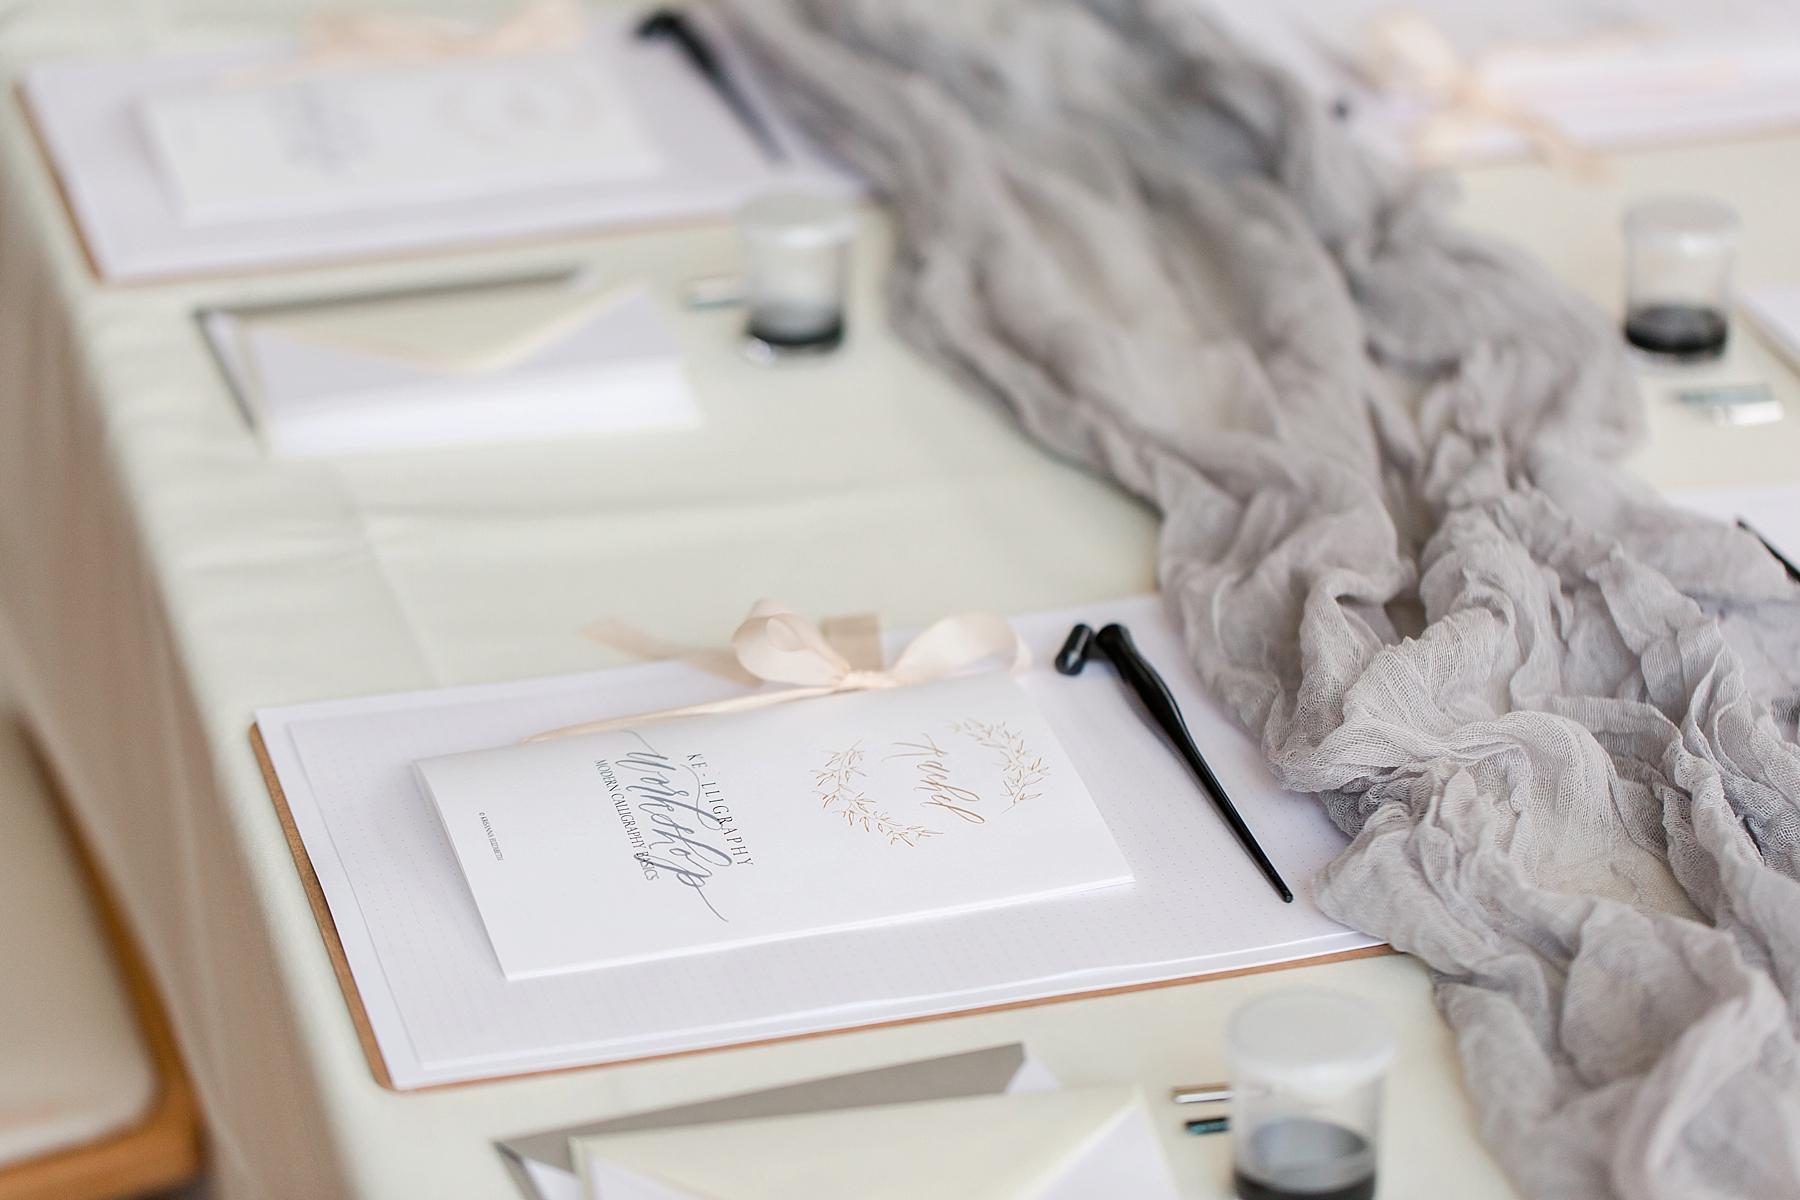 seattle-calligraphy-workshop_0020.jpg